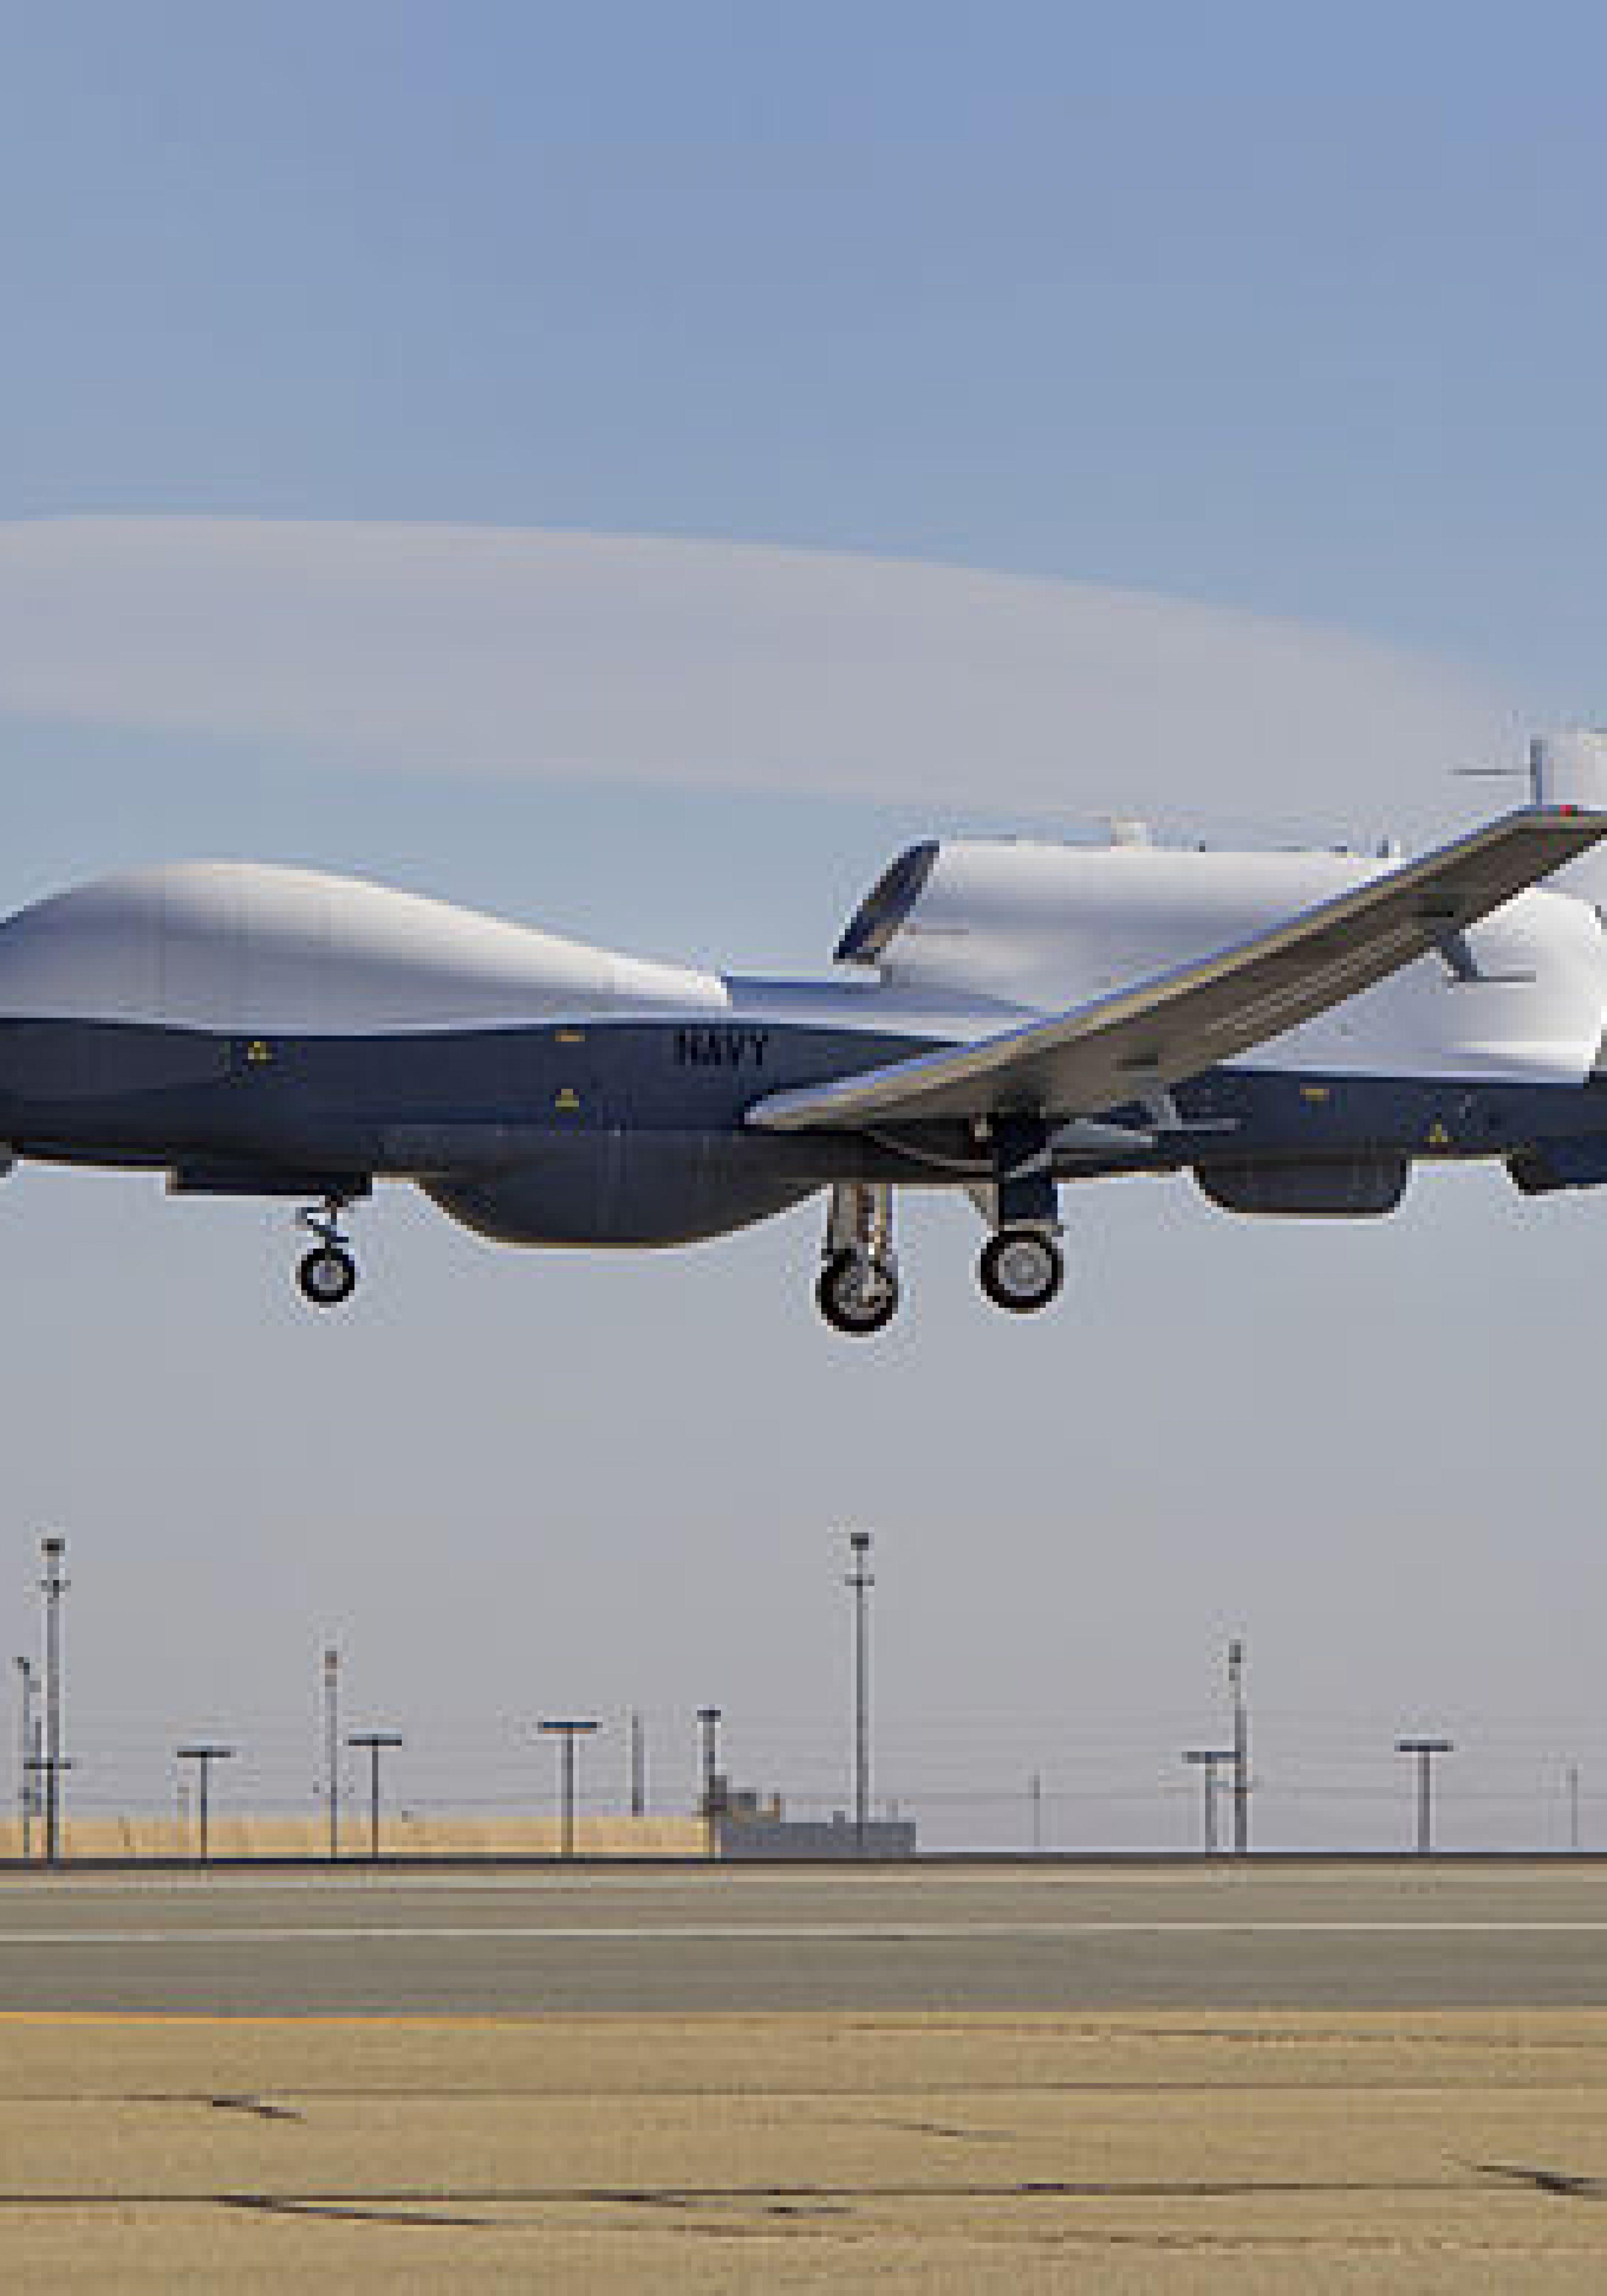 600px-MQ-4C_Triton_flight_testing-3500x5000.jpg